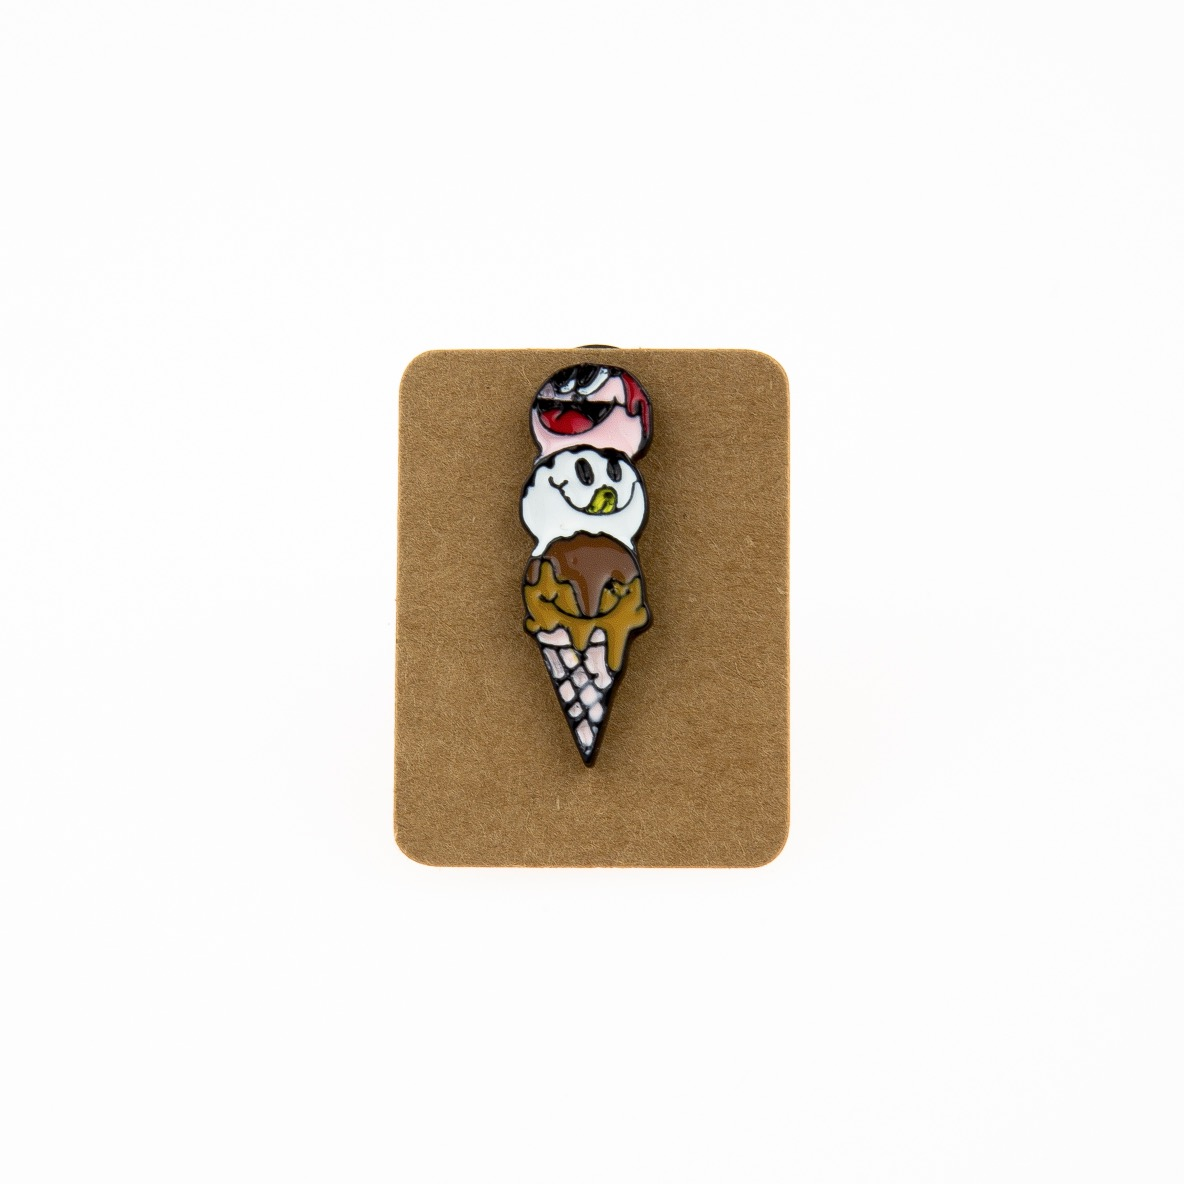 Metal Ice Cream Three Scoop Enamel Pin Badge